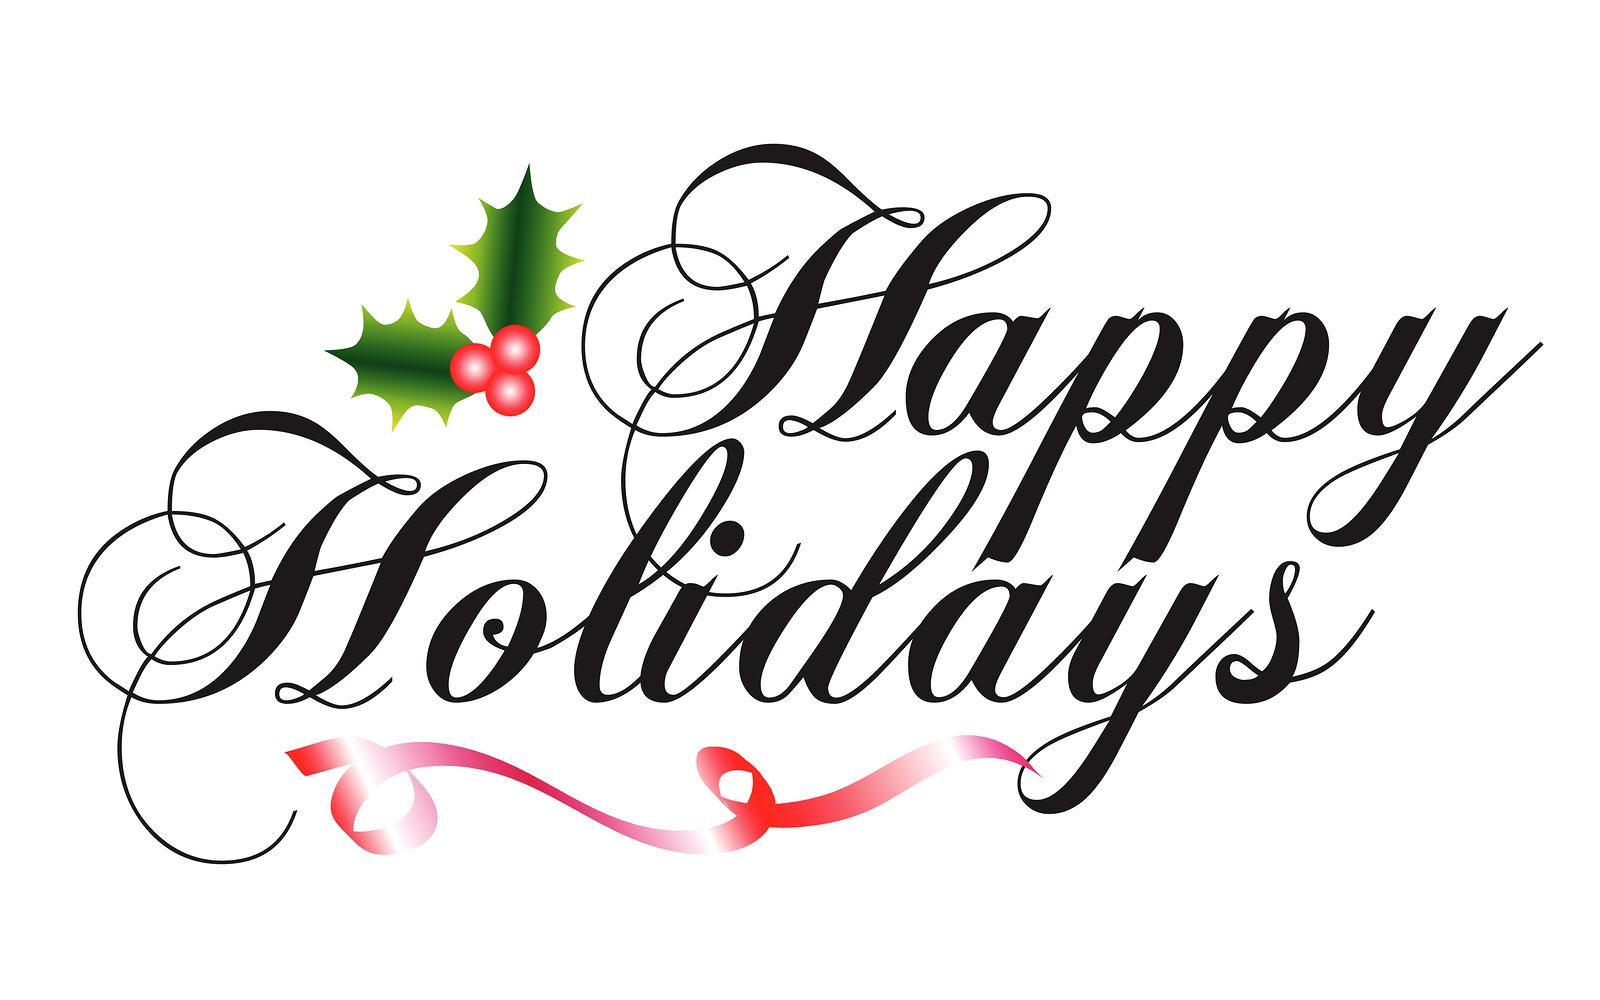 Seasons Greetings And Happy Holidays